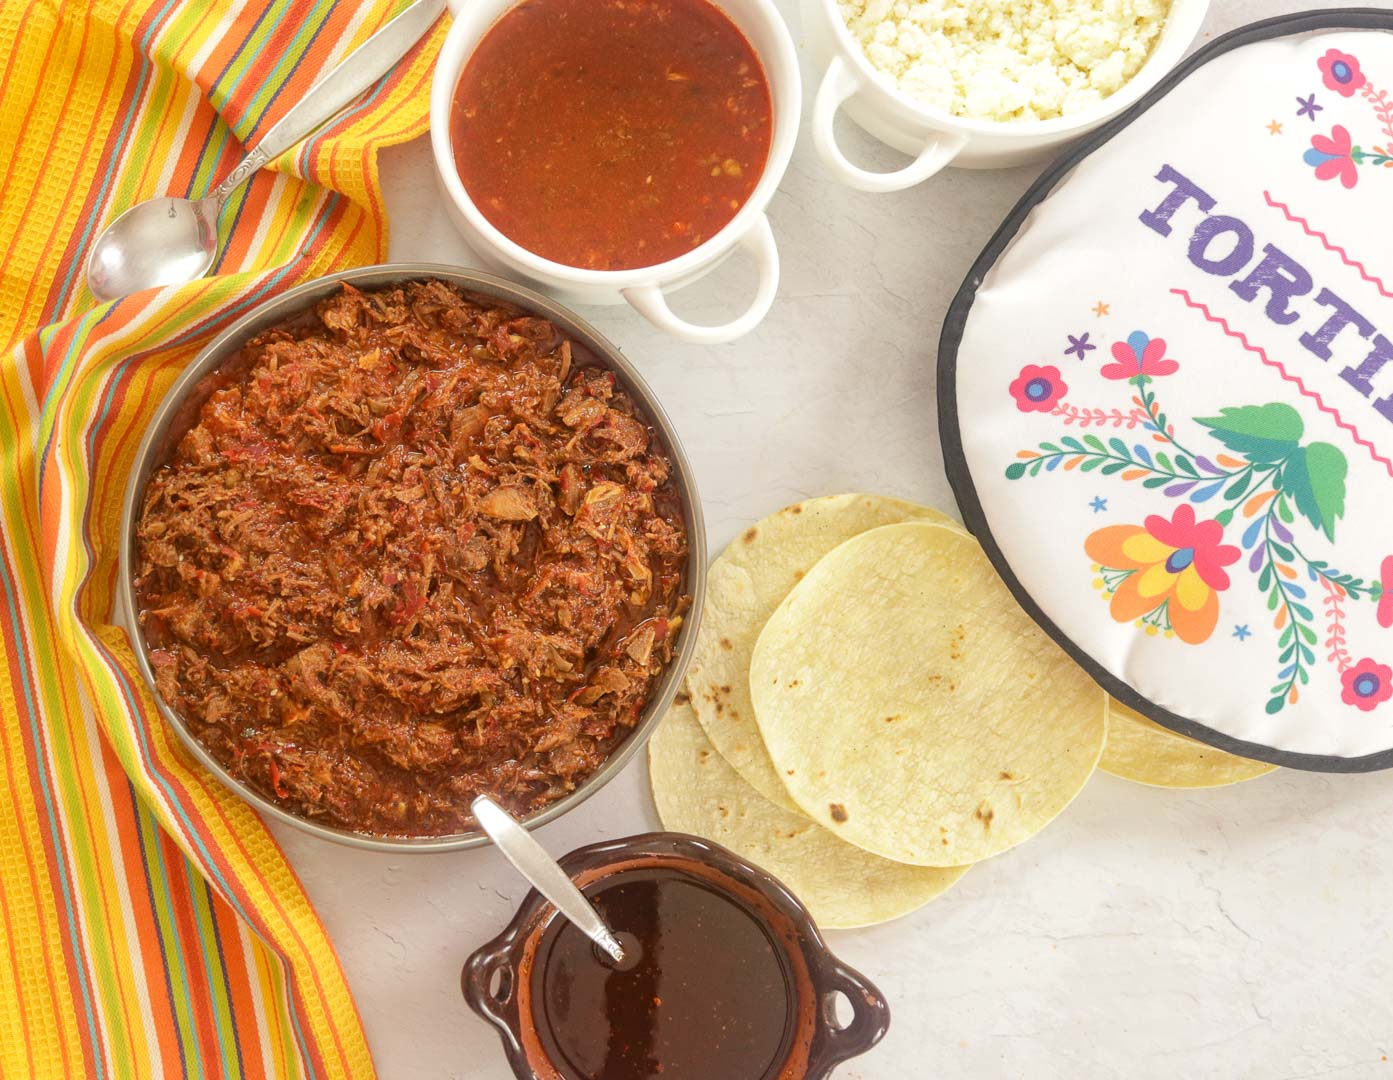 Goat Birria - consome - tortillas and salsa.